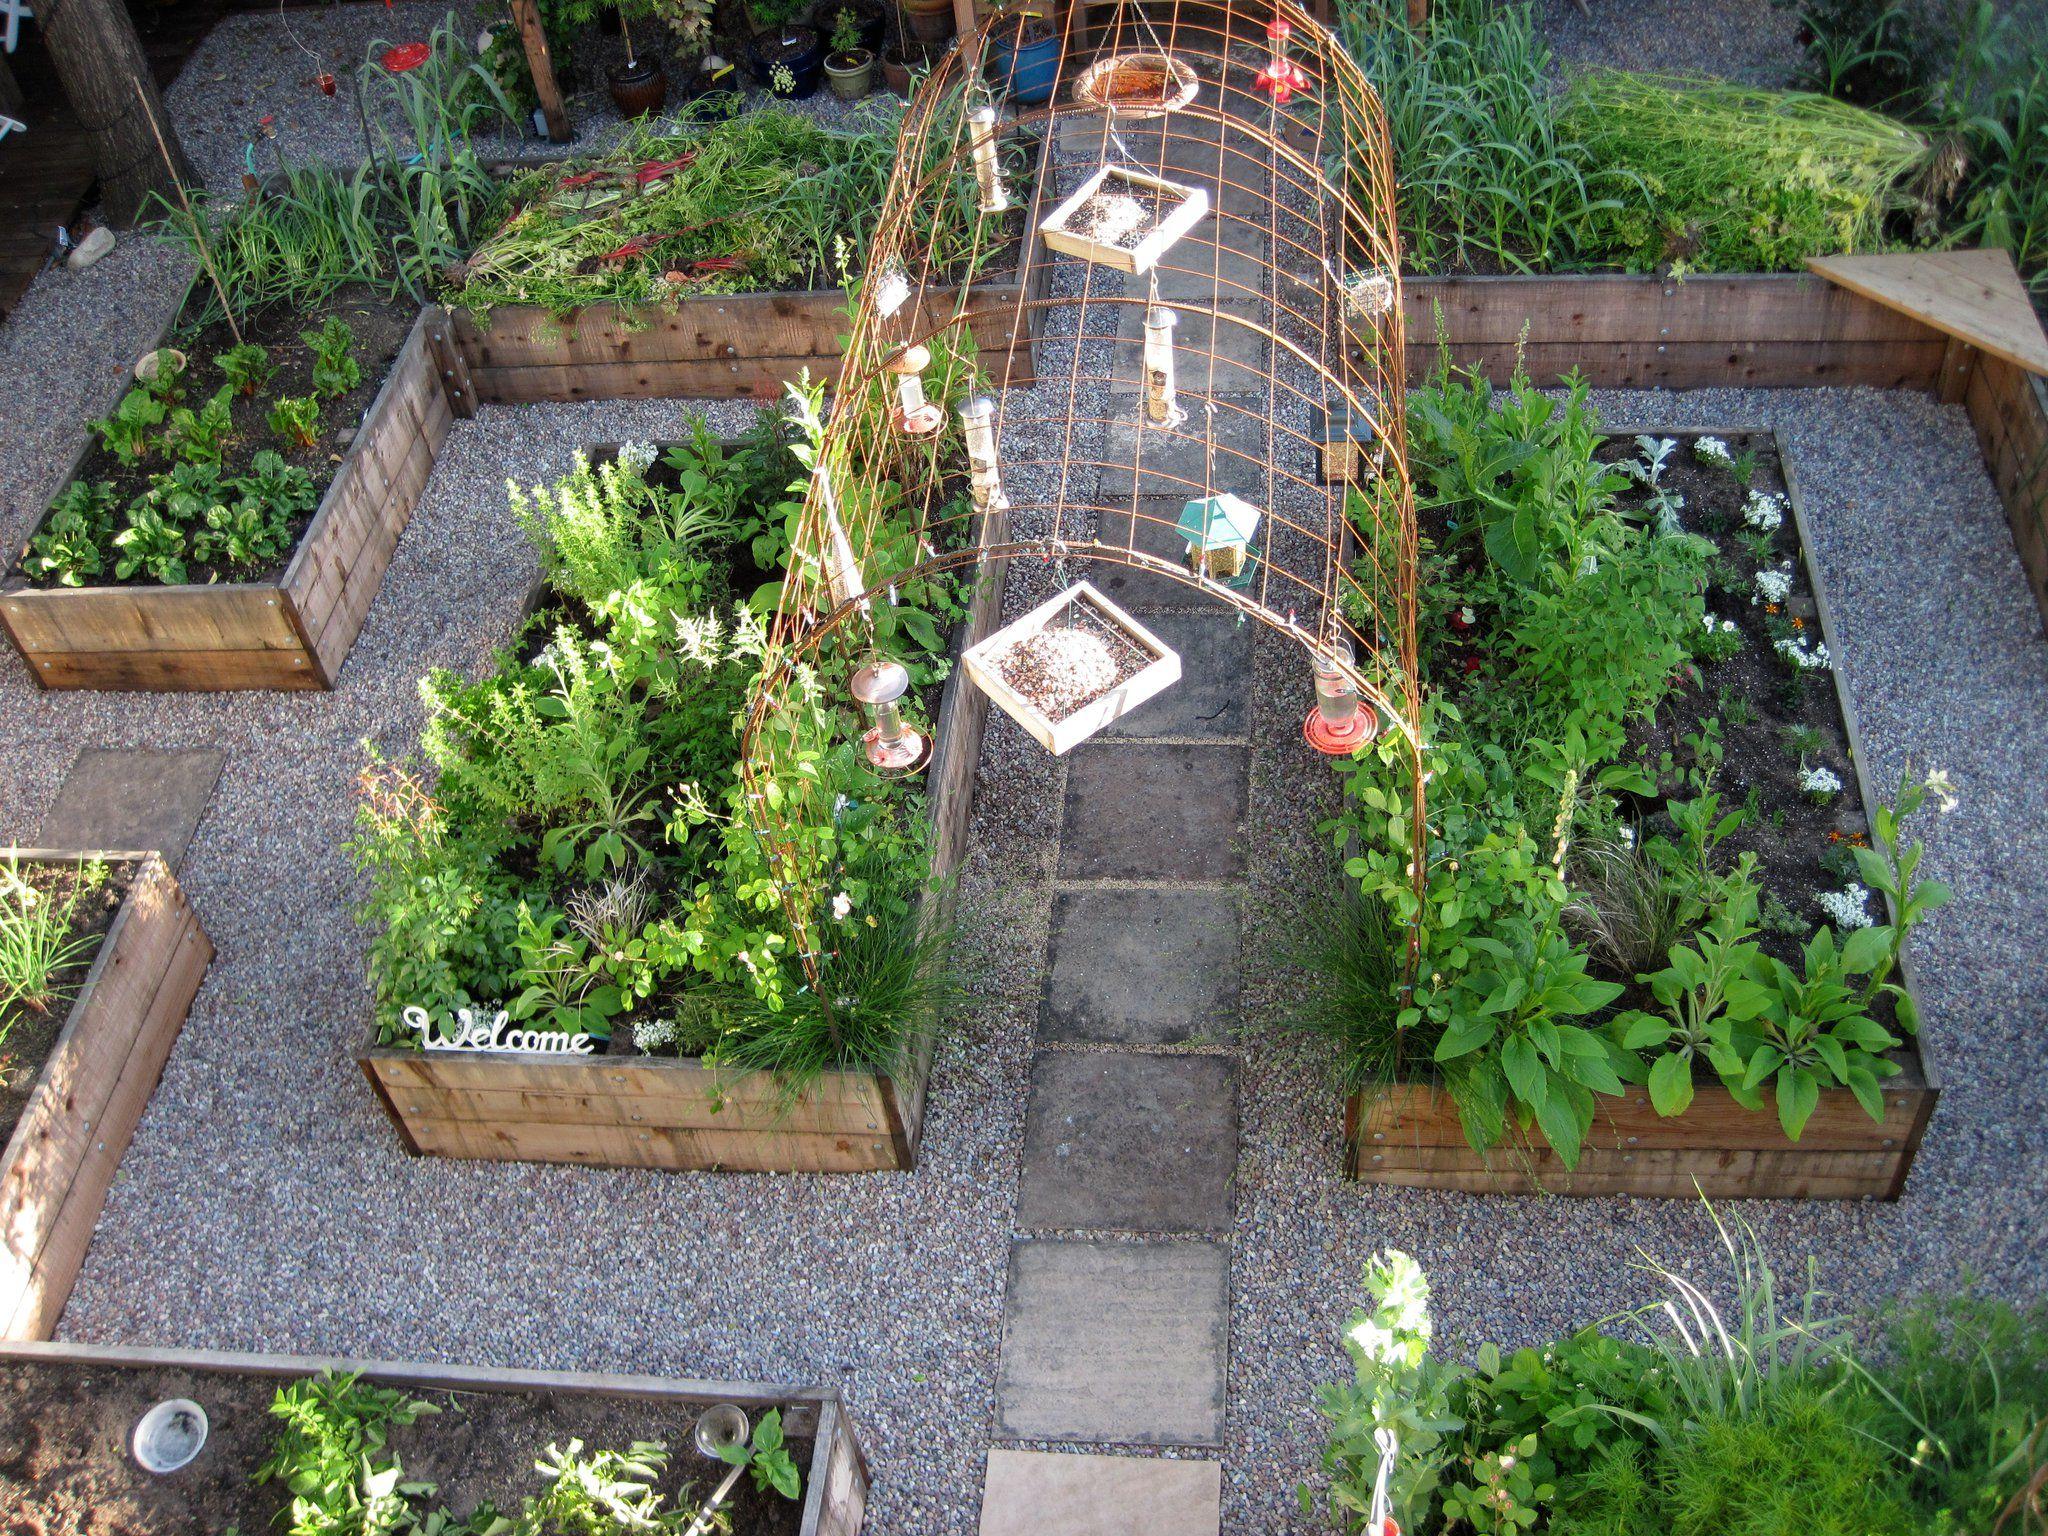 Country Gardens Kitchen Garden Guaranteed To Make You Smile